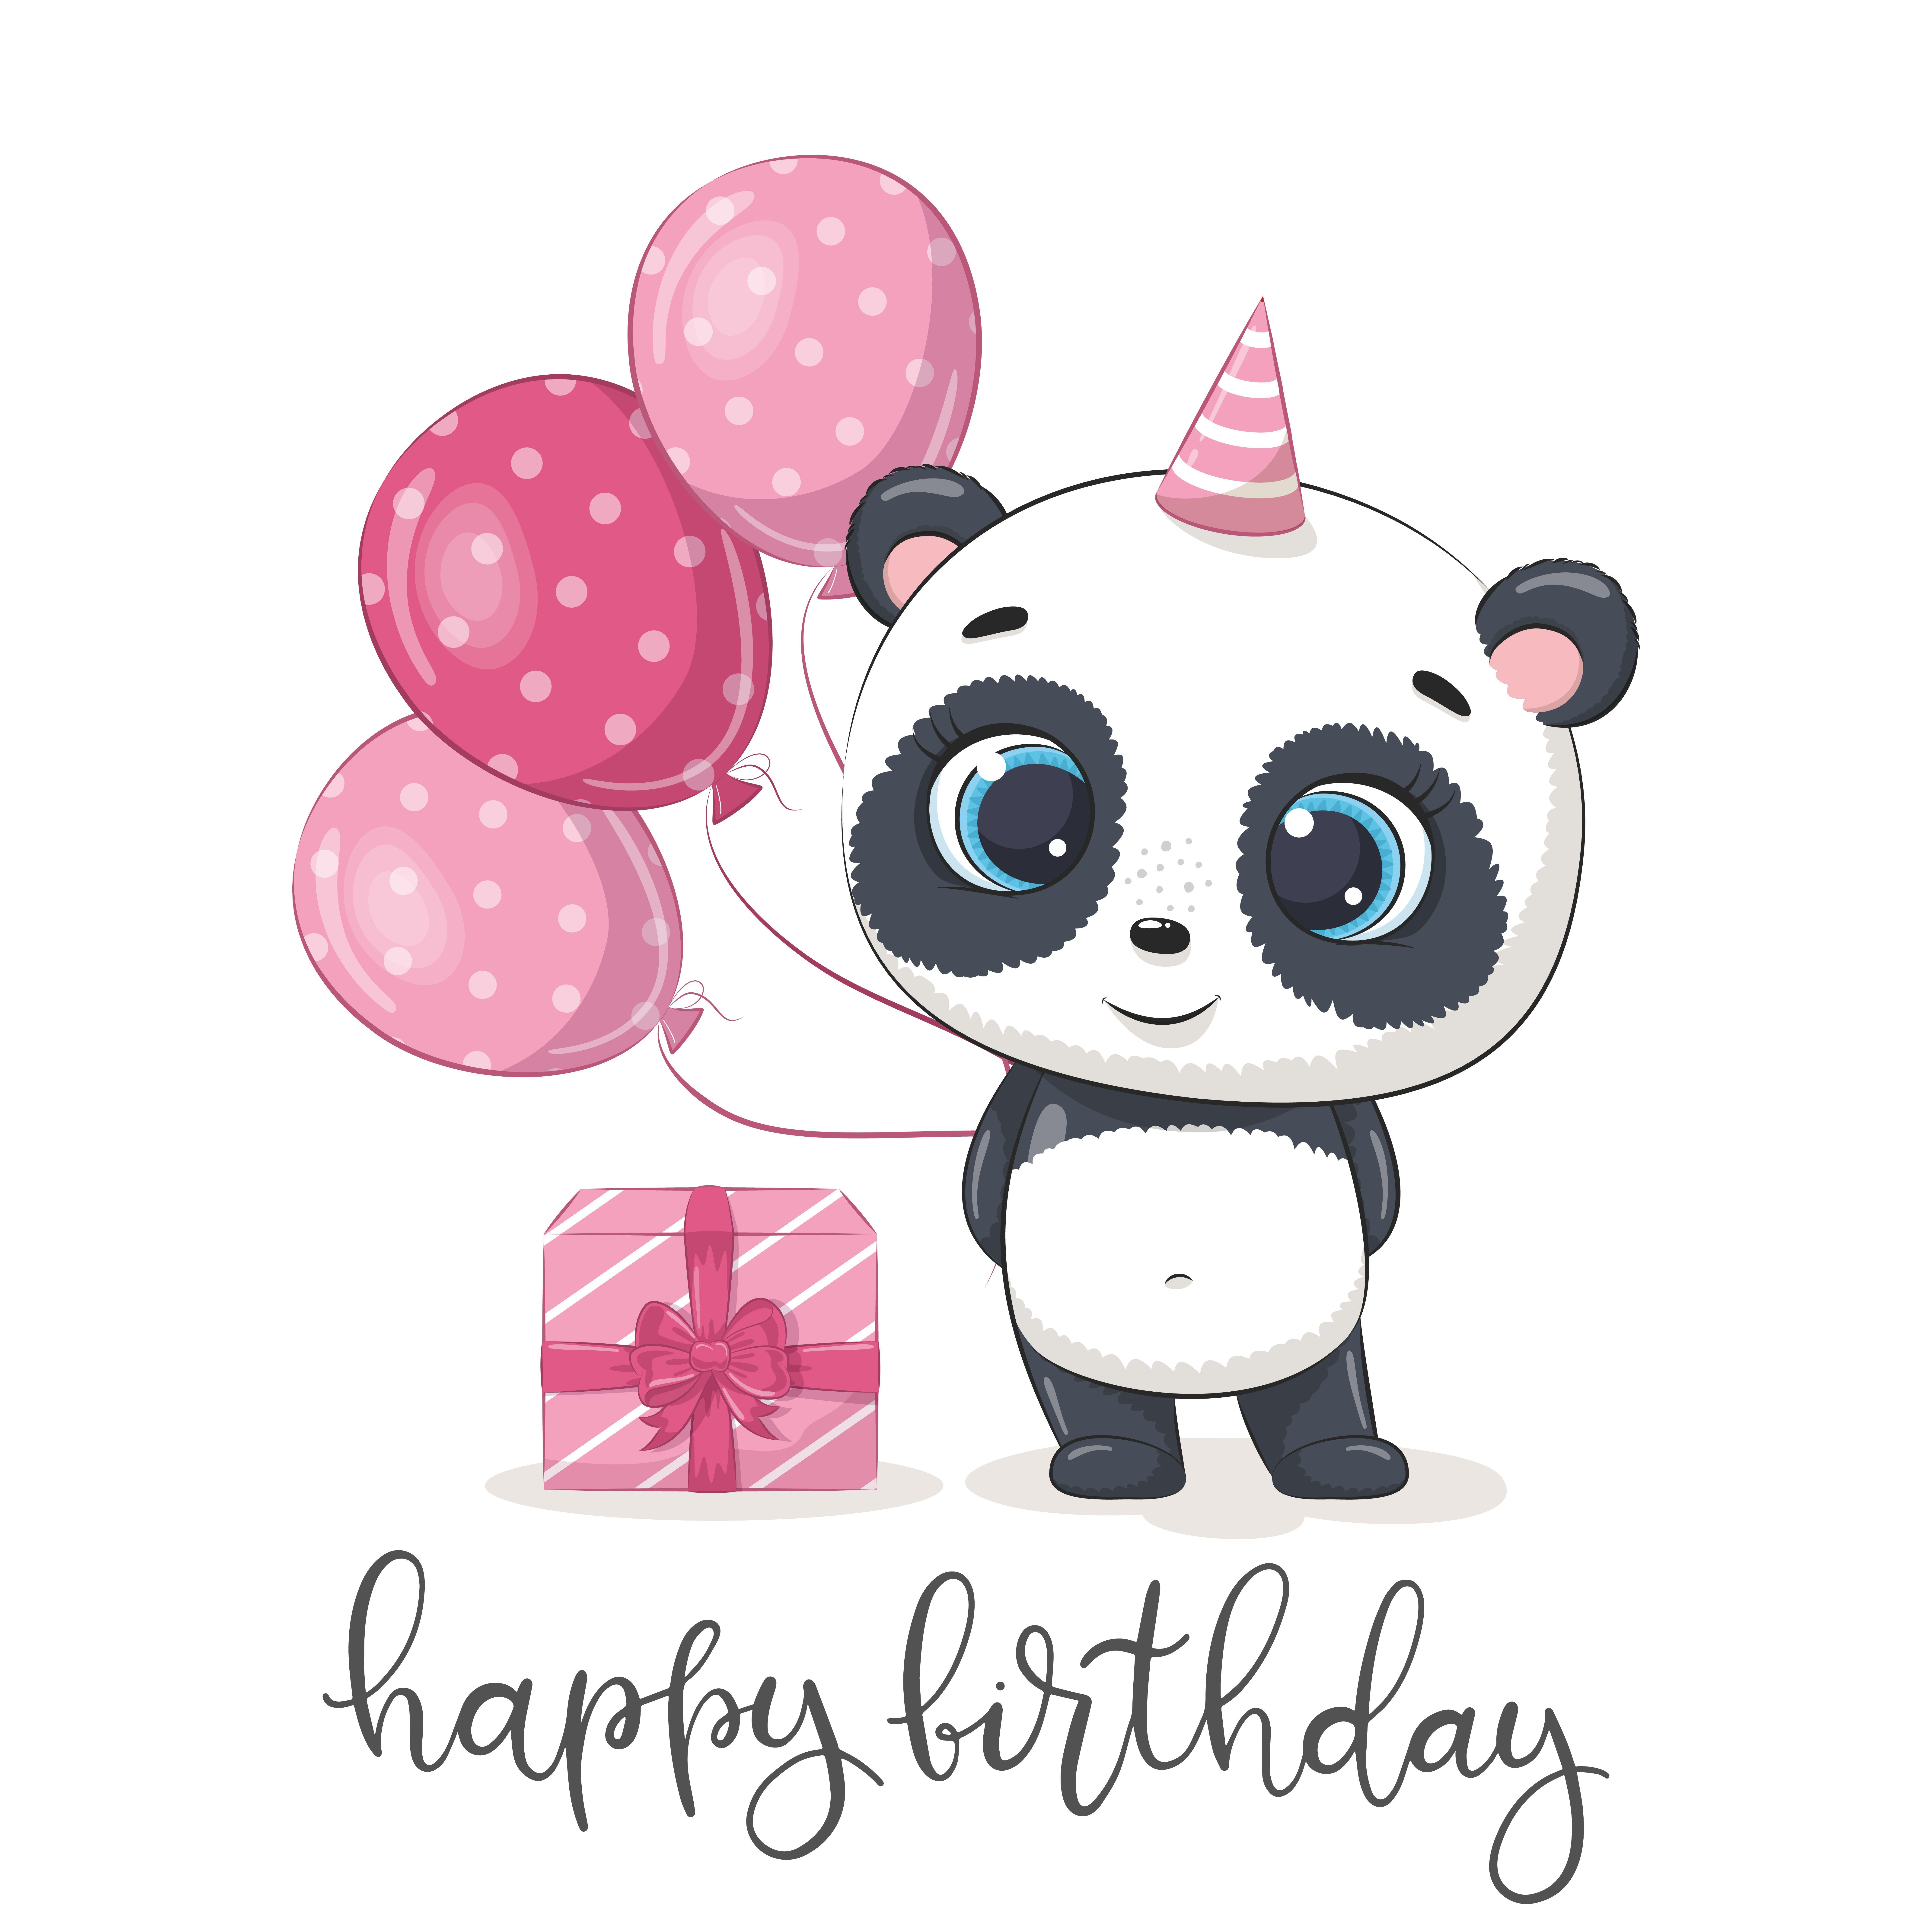 Cute Baby Panda Birthday Clipart Png Eps Girl Birthday Etsy In 2021 Panda Birthday Cute Panda Wallpaper Birthday Clipart